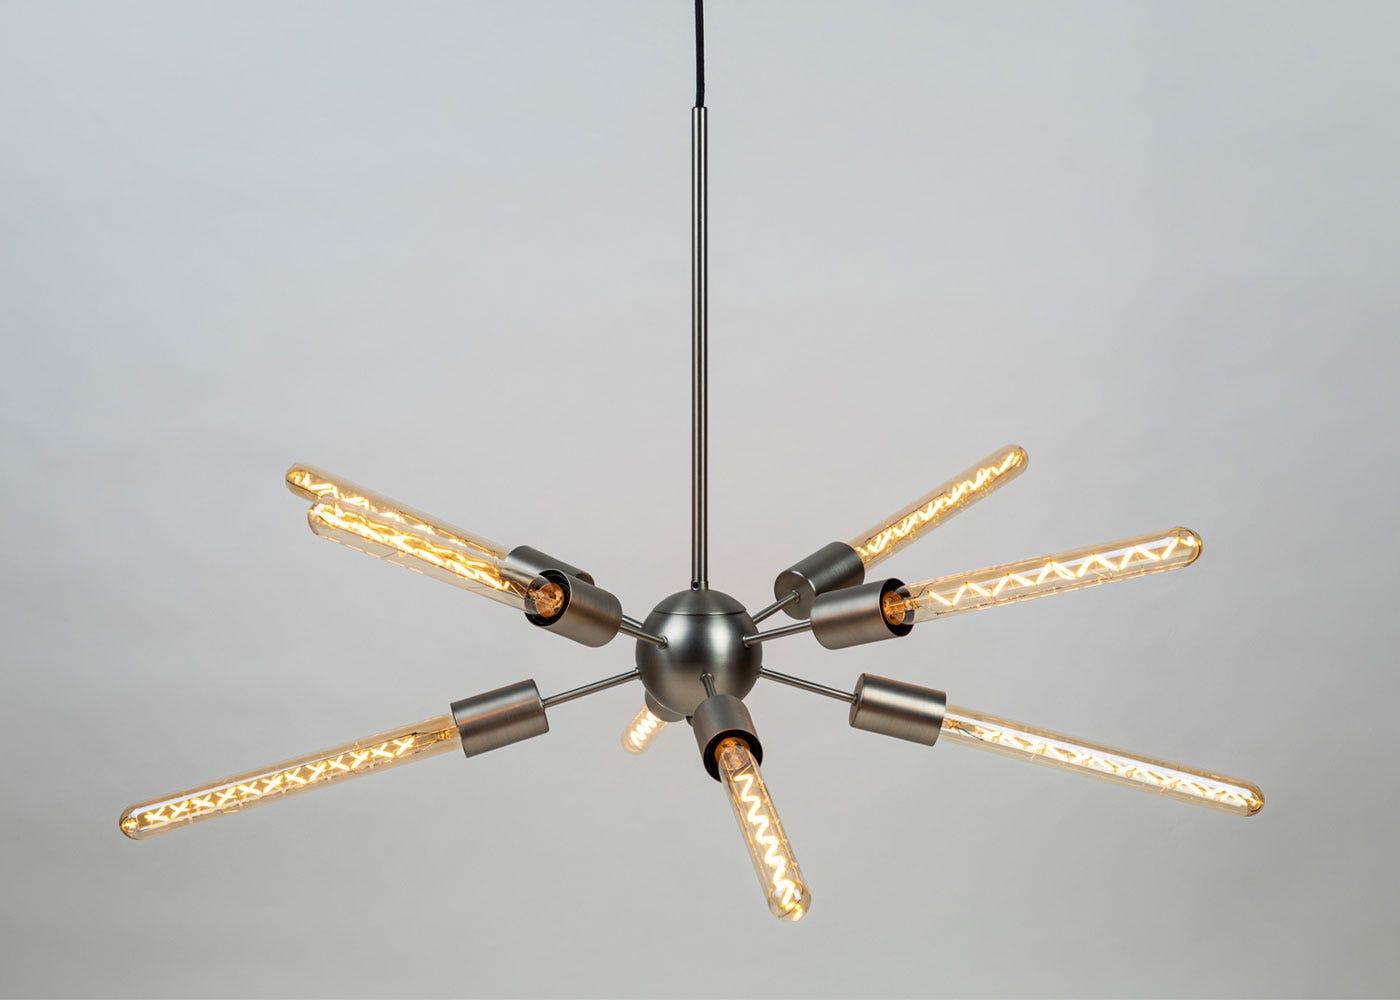 As shown: Satin nickel Junction with Tala Totem III bulbs